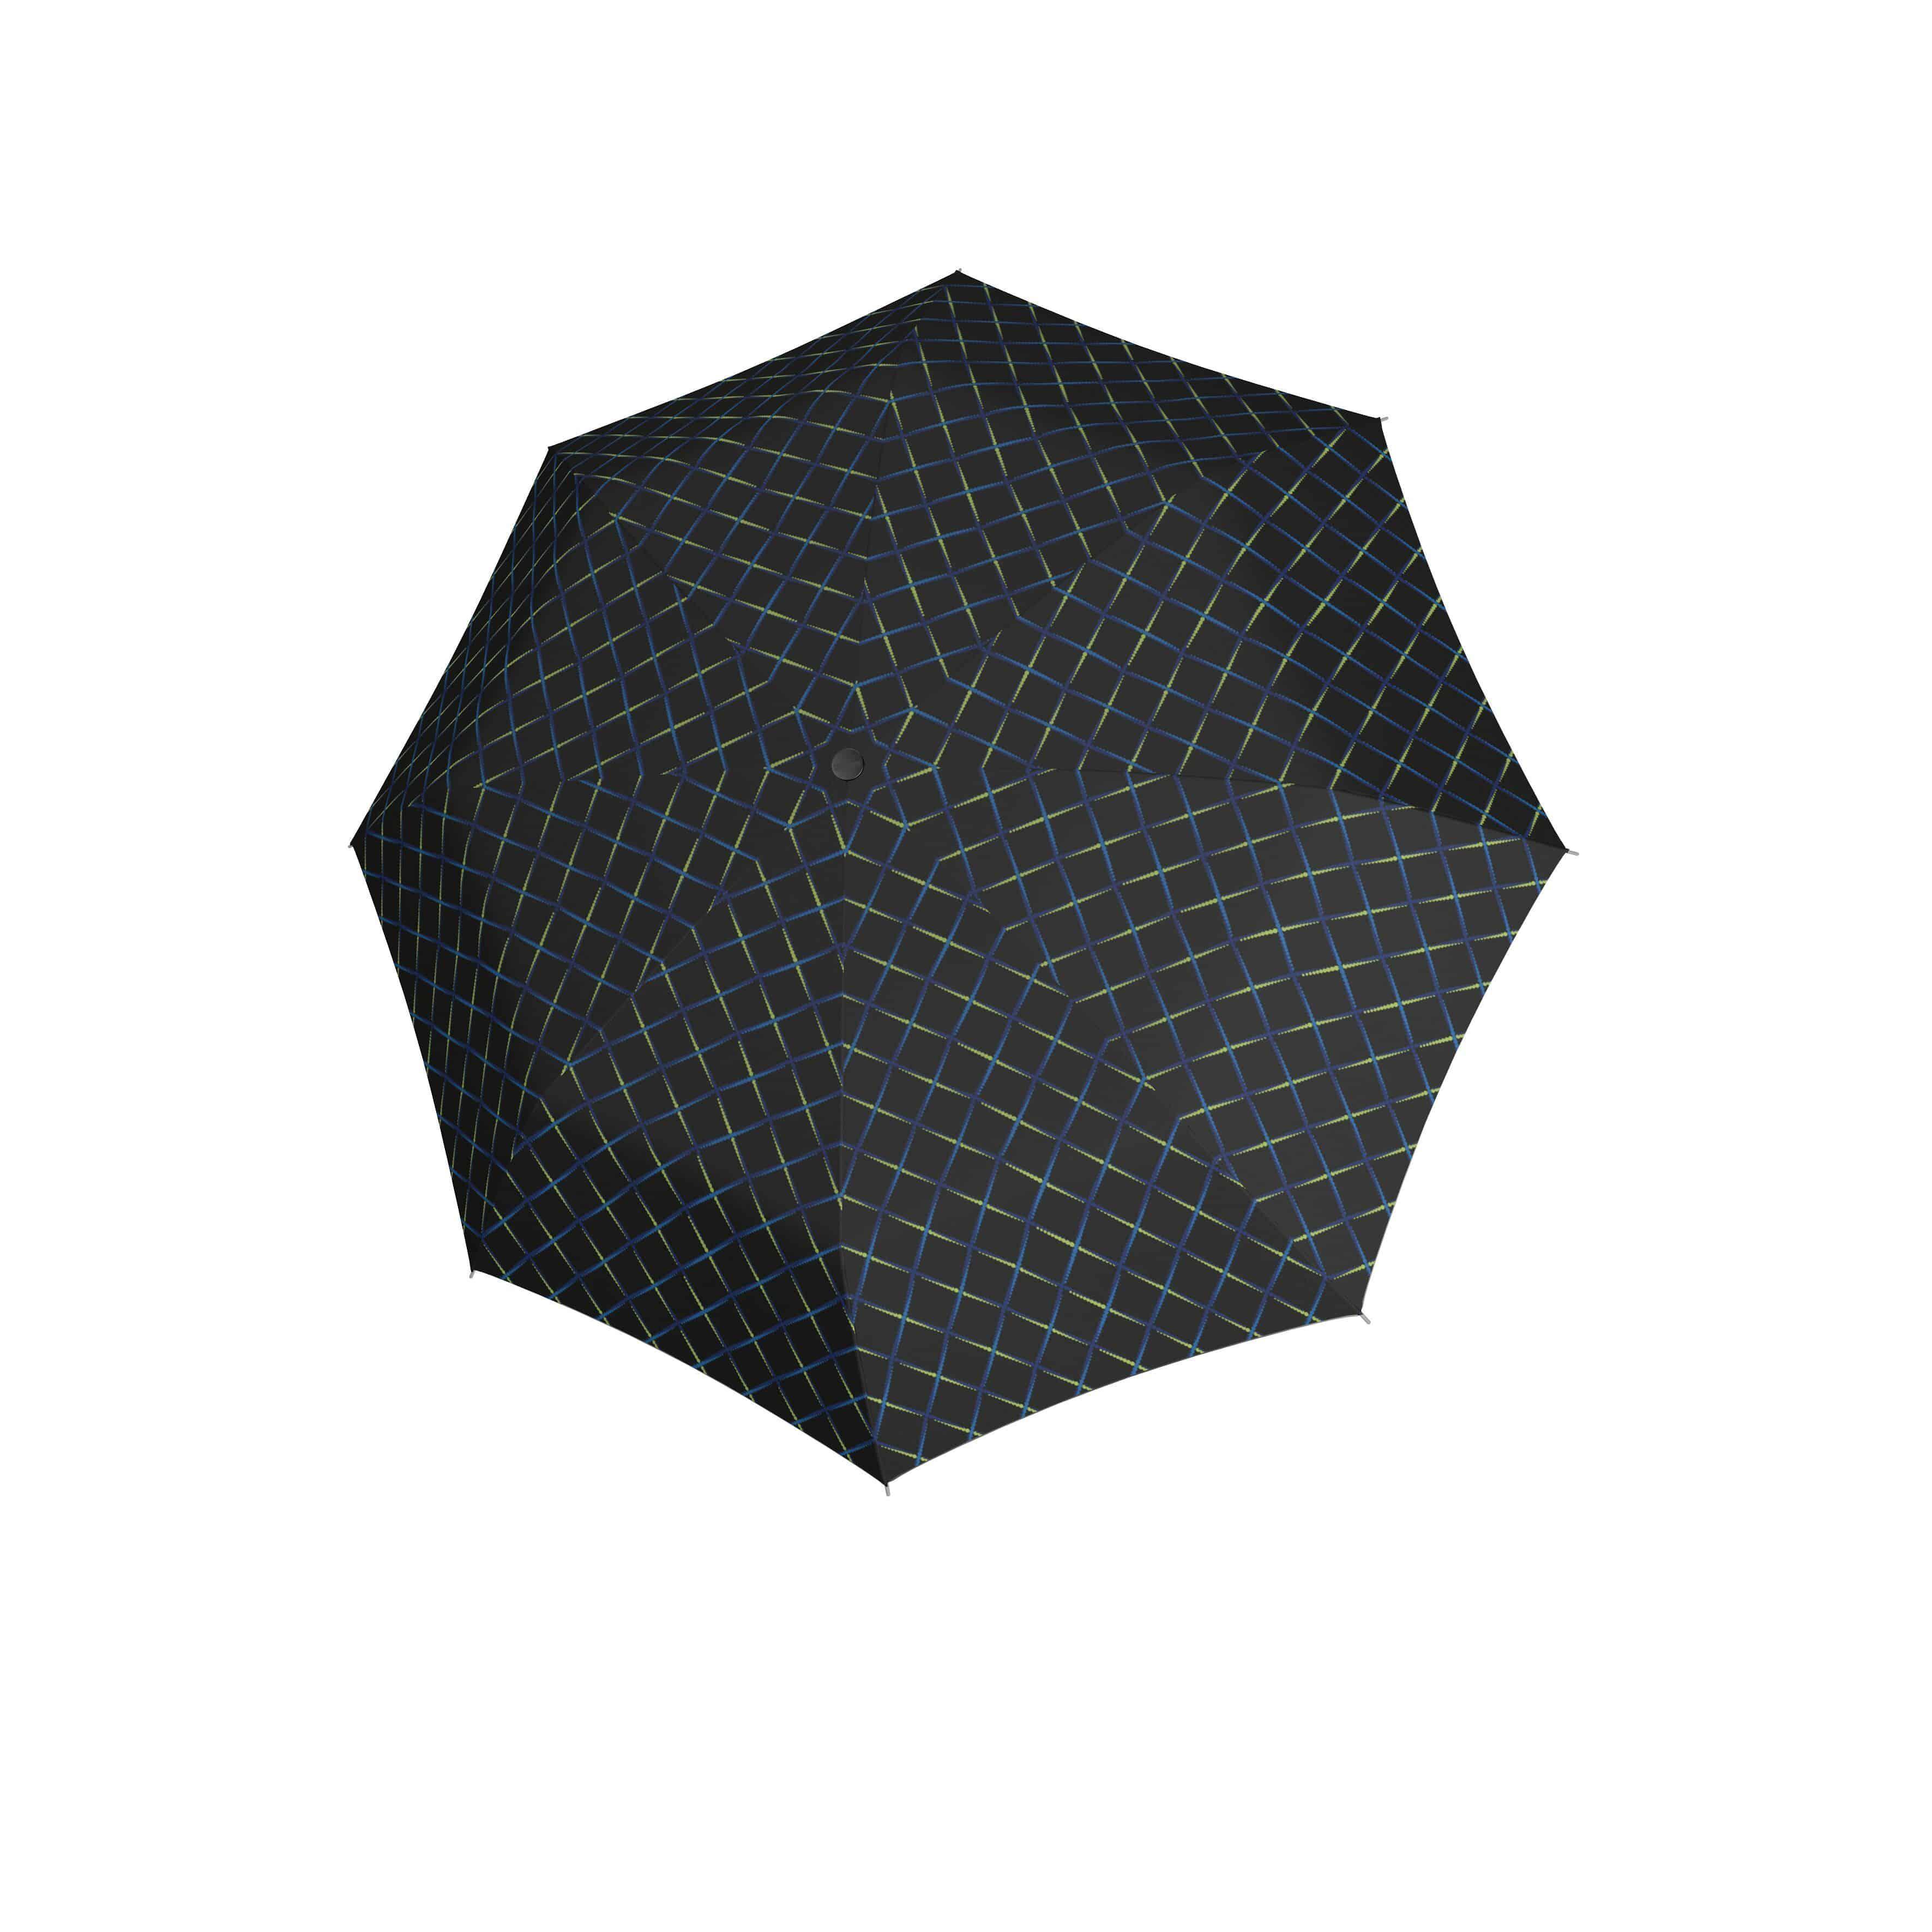 Knirps Umbrella X1 manual (8 ribs) - photo 2